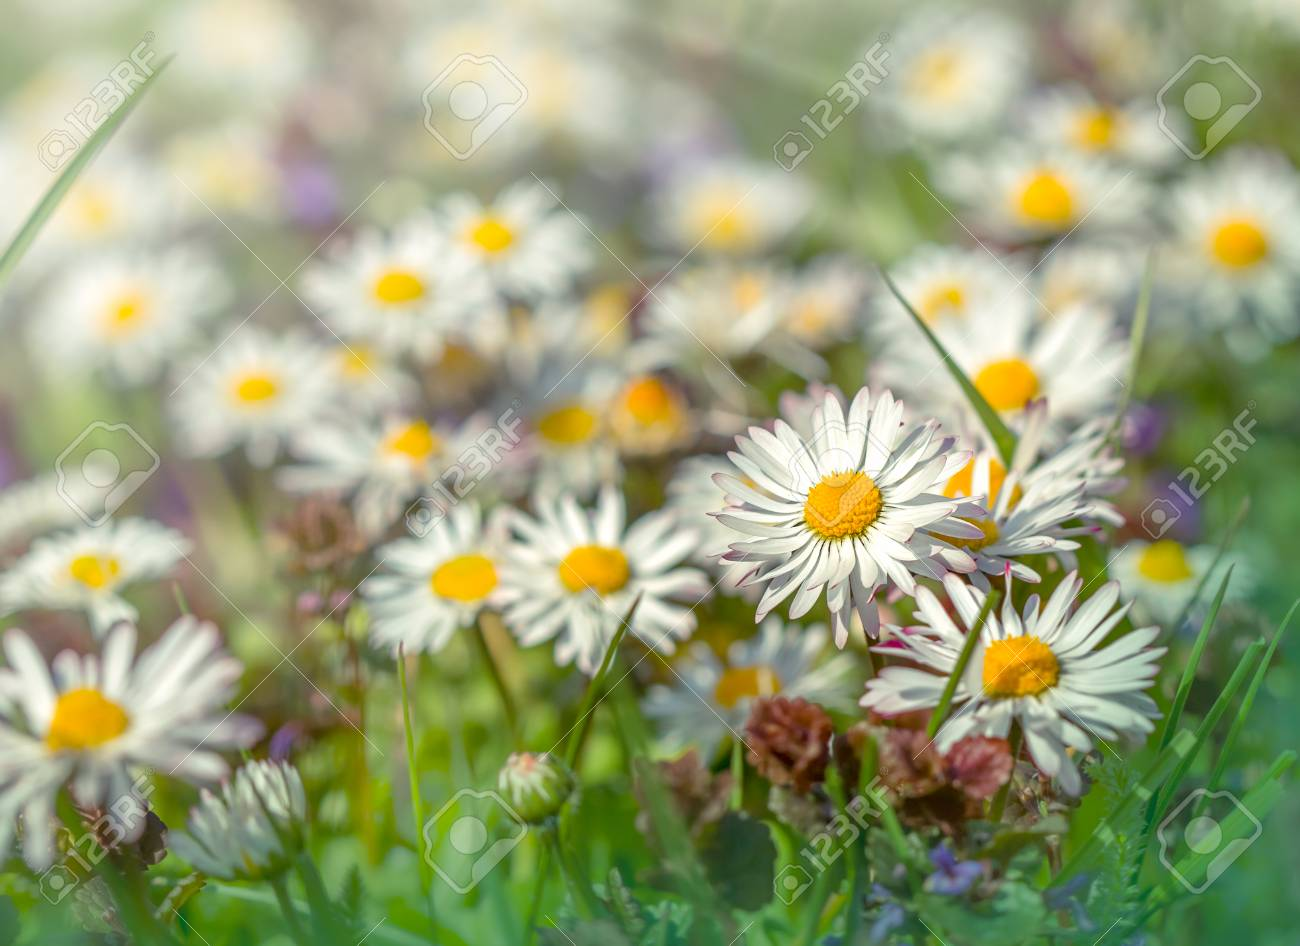 Beautiful daisy flowers in meadow springtime stock photo picture beautiful daisy flowers in meadow springtime stock photo 54281739 izmirmasajfo Choice Image